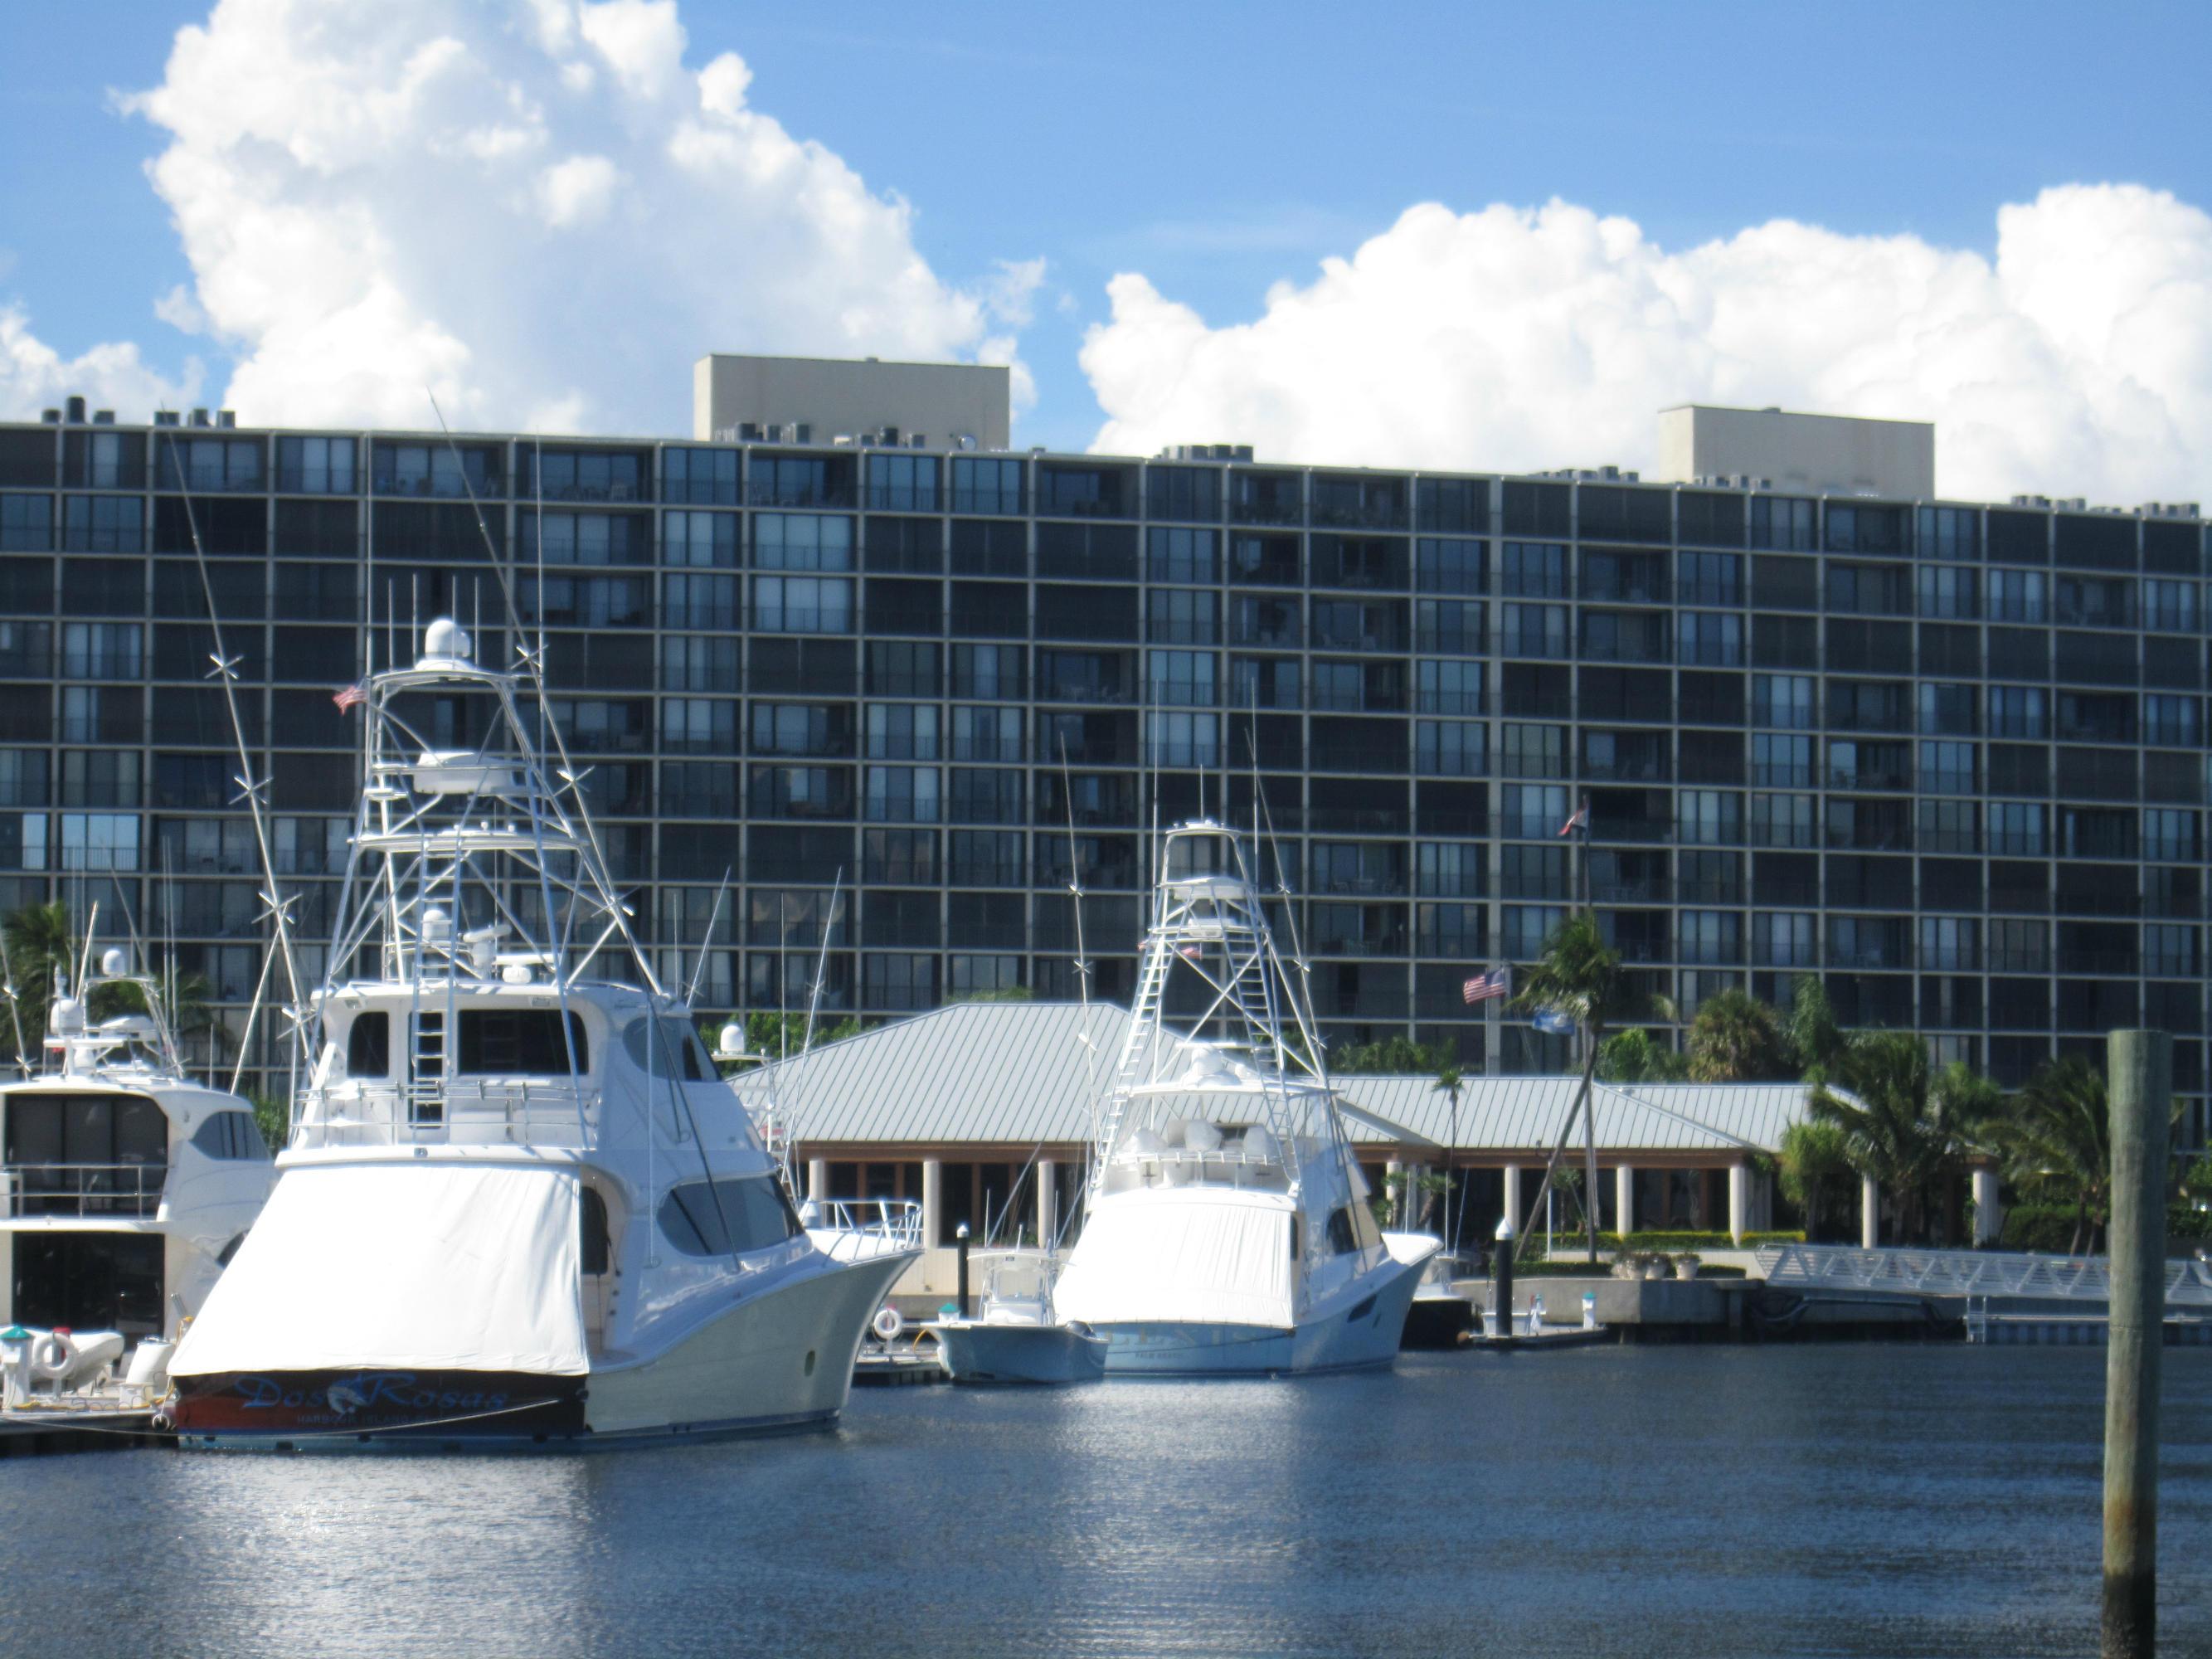 126 Lakeshore Drive 225, North Palm Beach, Florida 33408, 2 Bedrooms Bedrooms, ,2 BathroomsBathrooms,F,Condominium,Lakeshore,RX-10551810